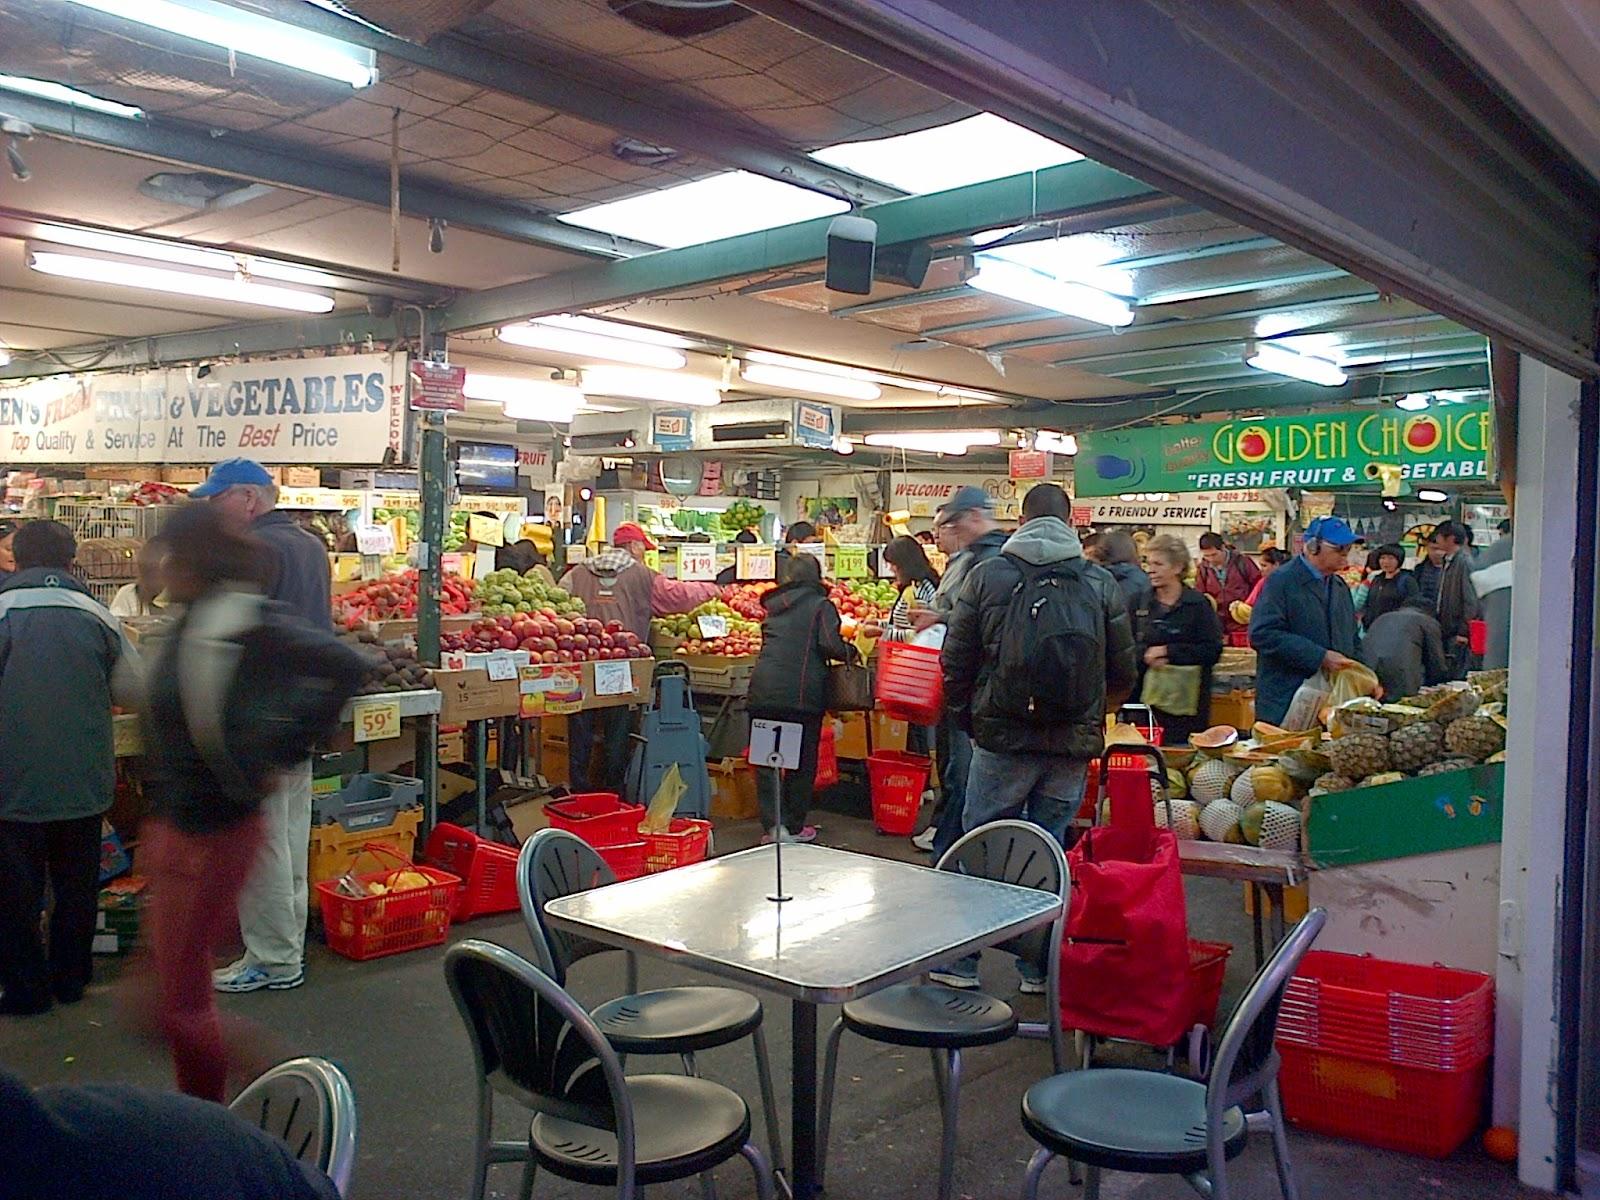 subiaco muslim Best halal restaurants in perth: see tripadvisor traveler reviews of halal restaurants in perth.